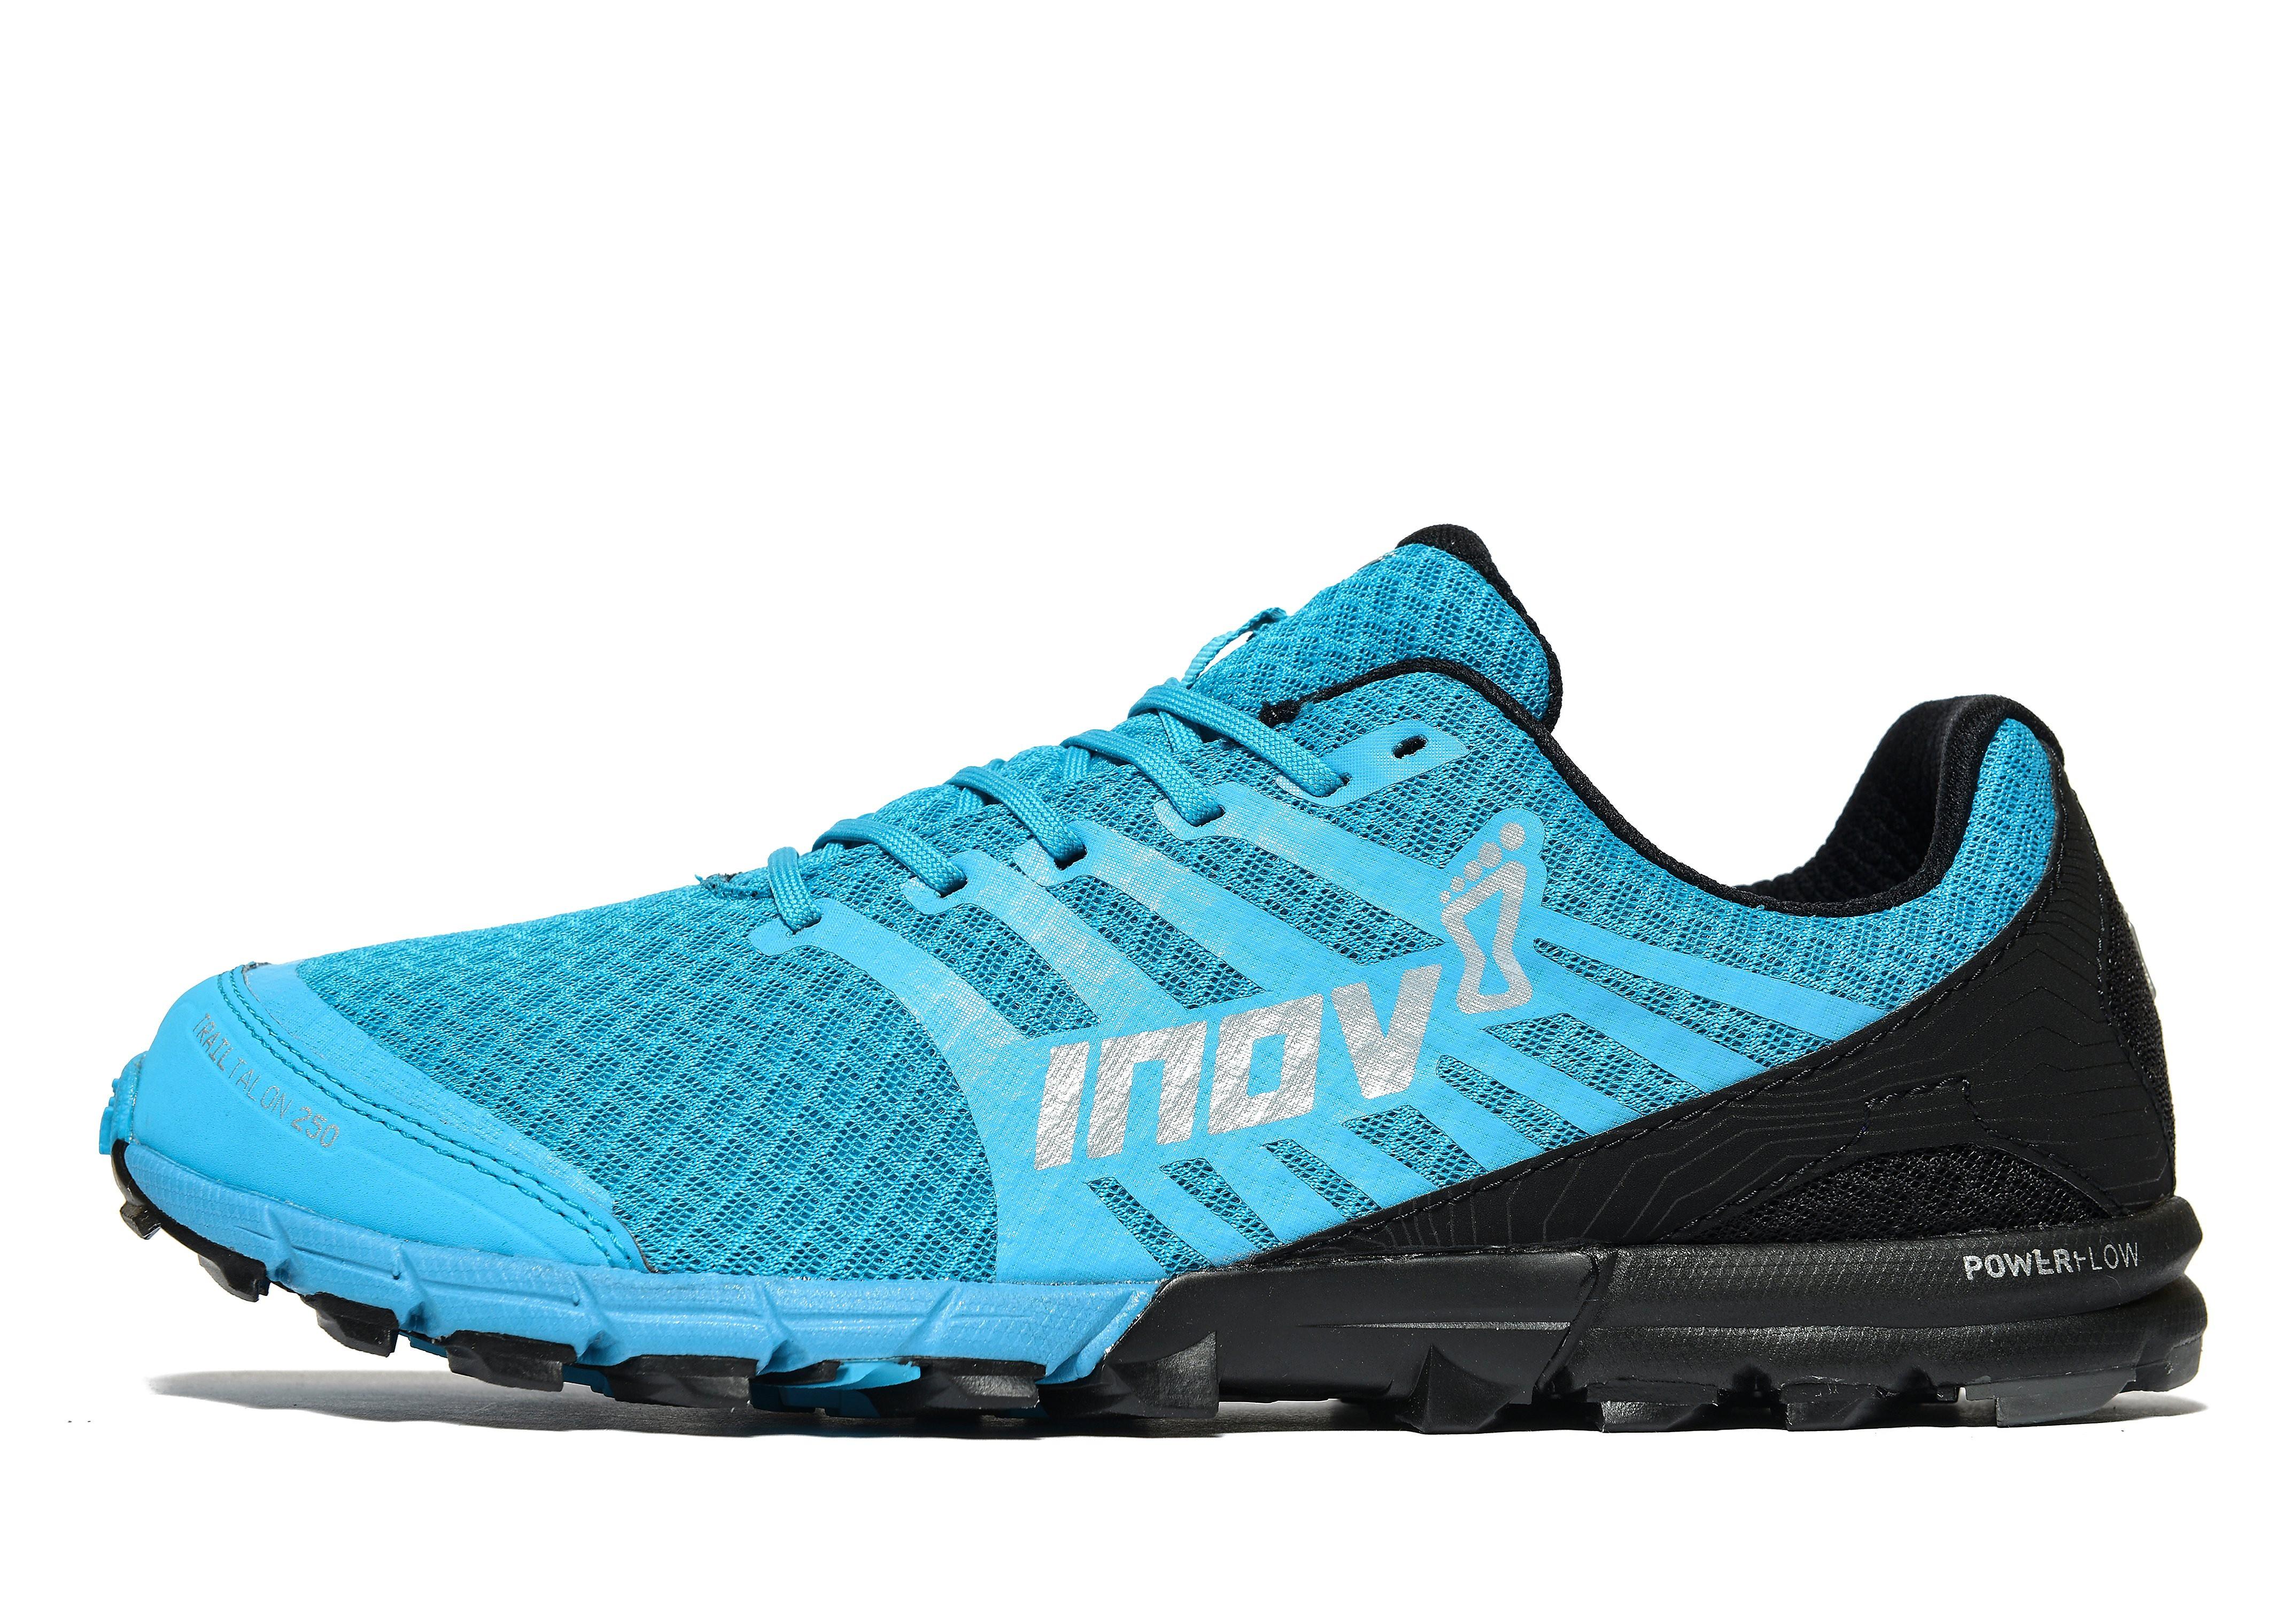 Inov-8 Trail Talon 250 Trail Running Shoes